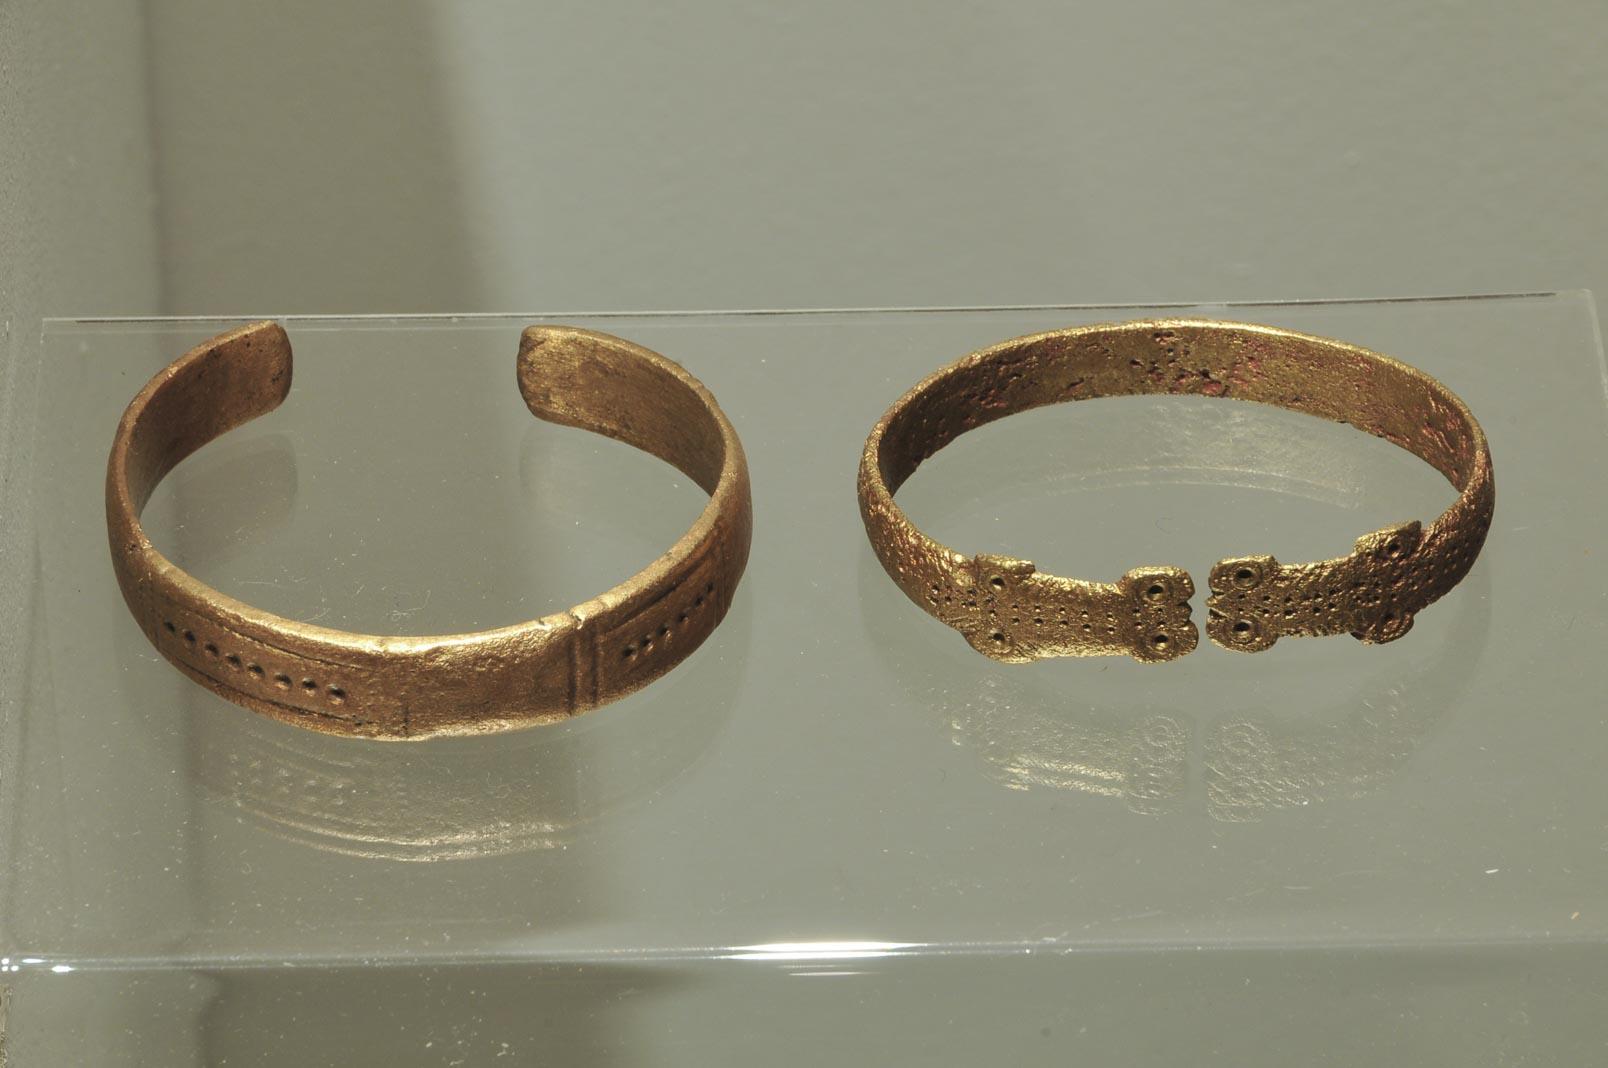 troyan-museum-arheologichesko-nasledstvo-26